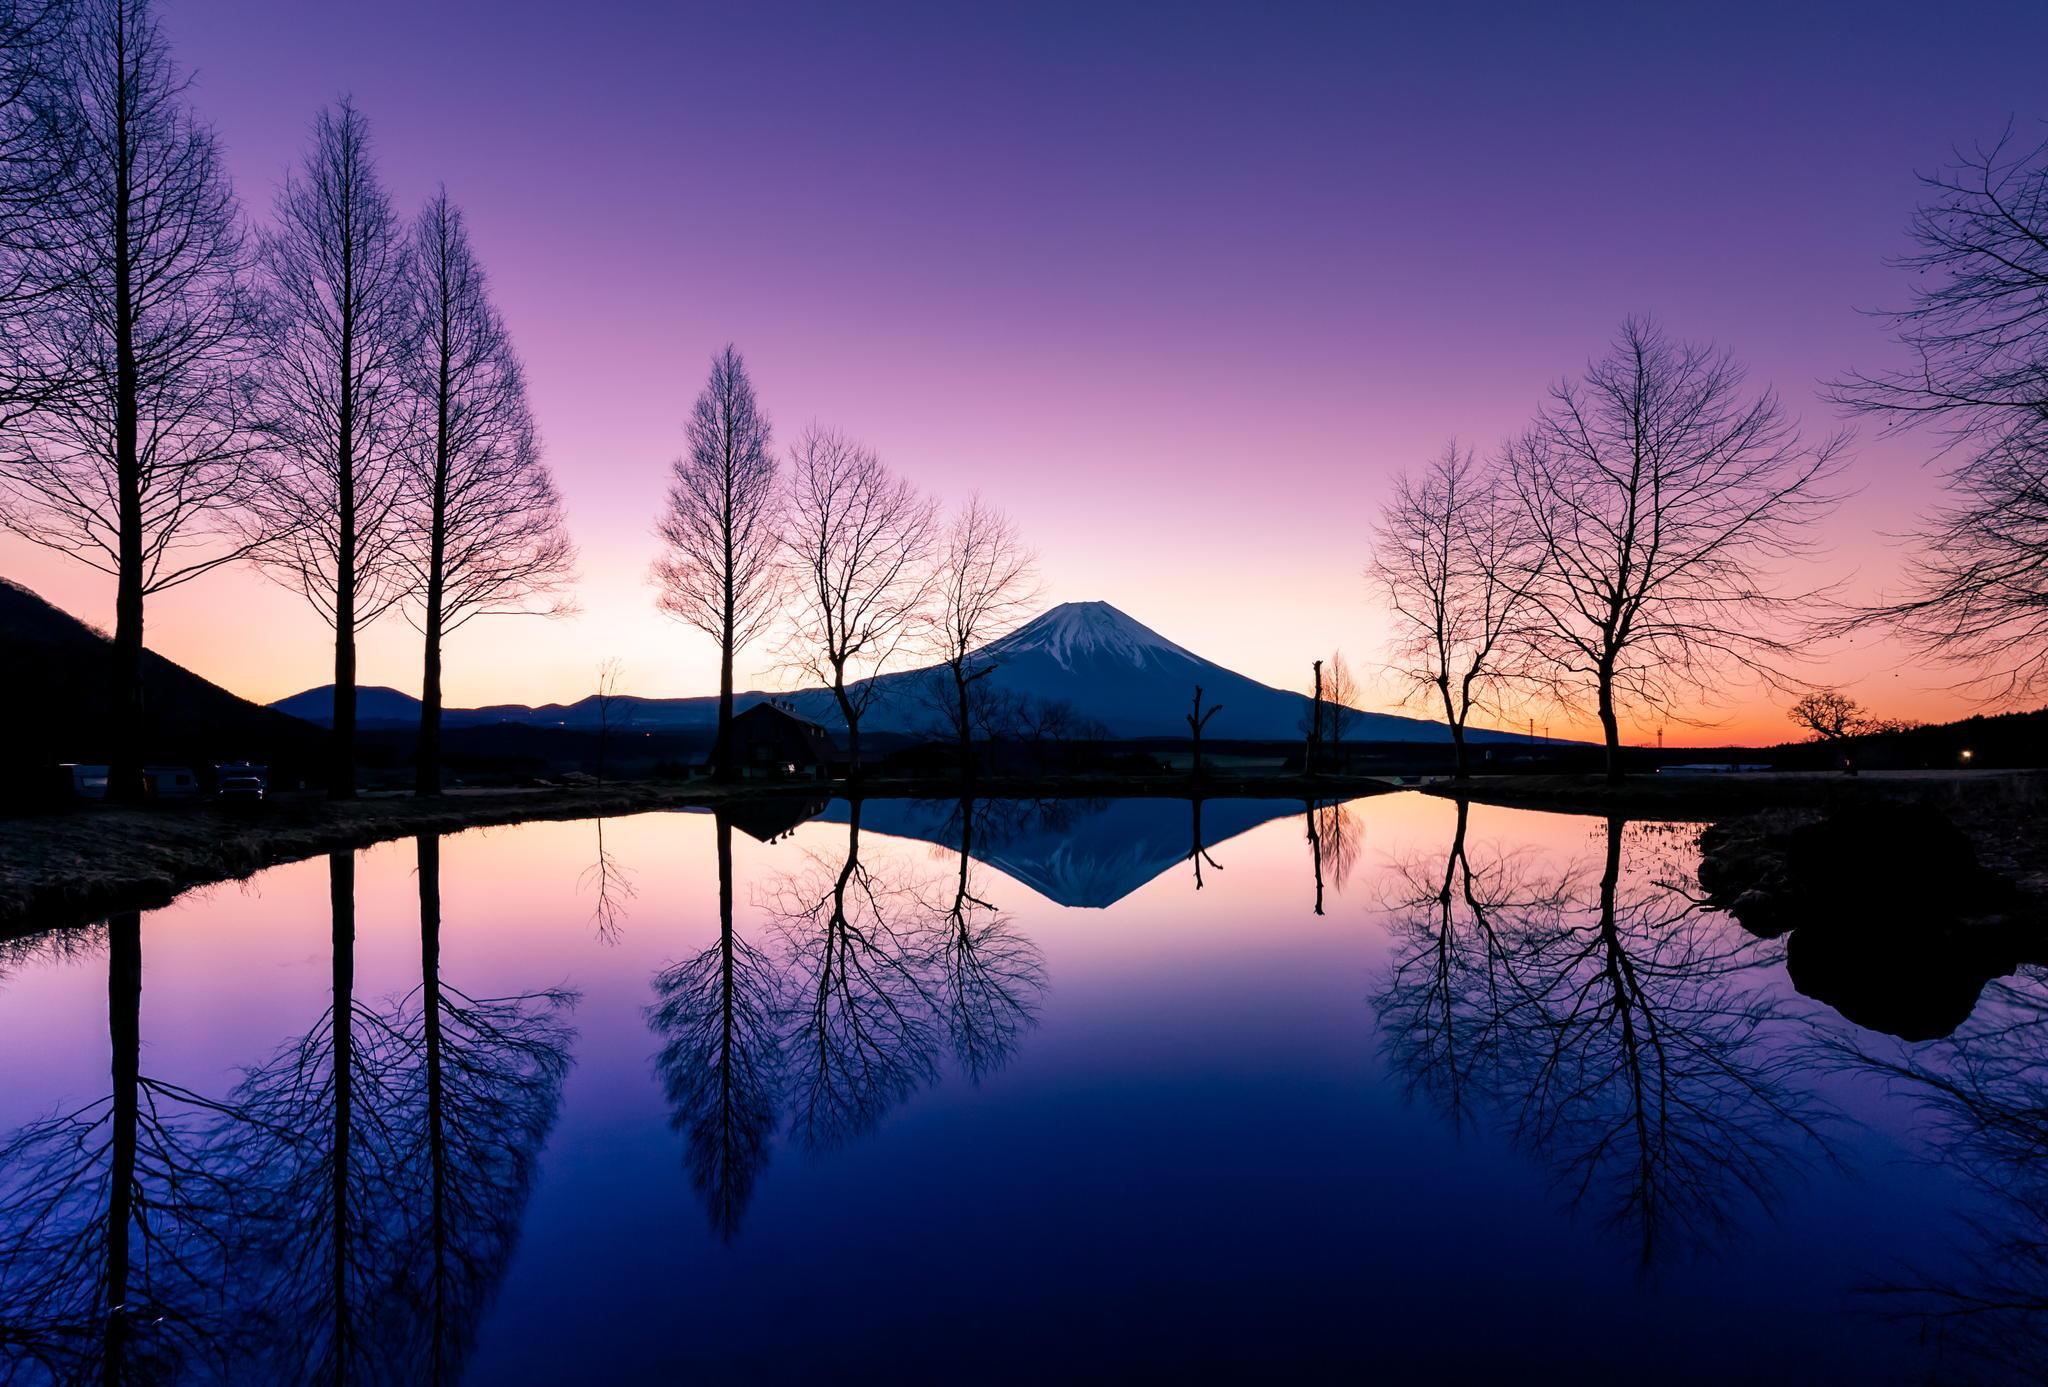 by Yasuhiko Yarimizu